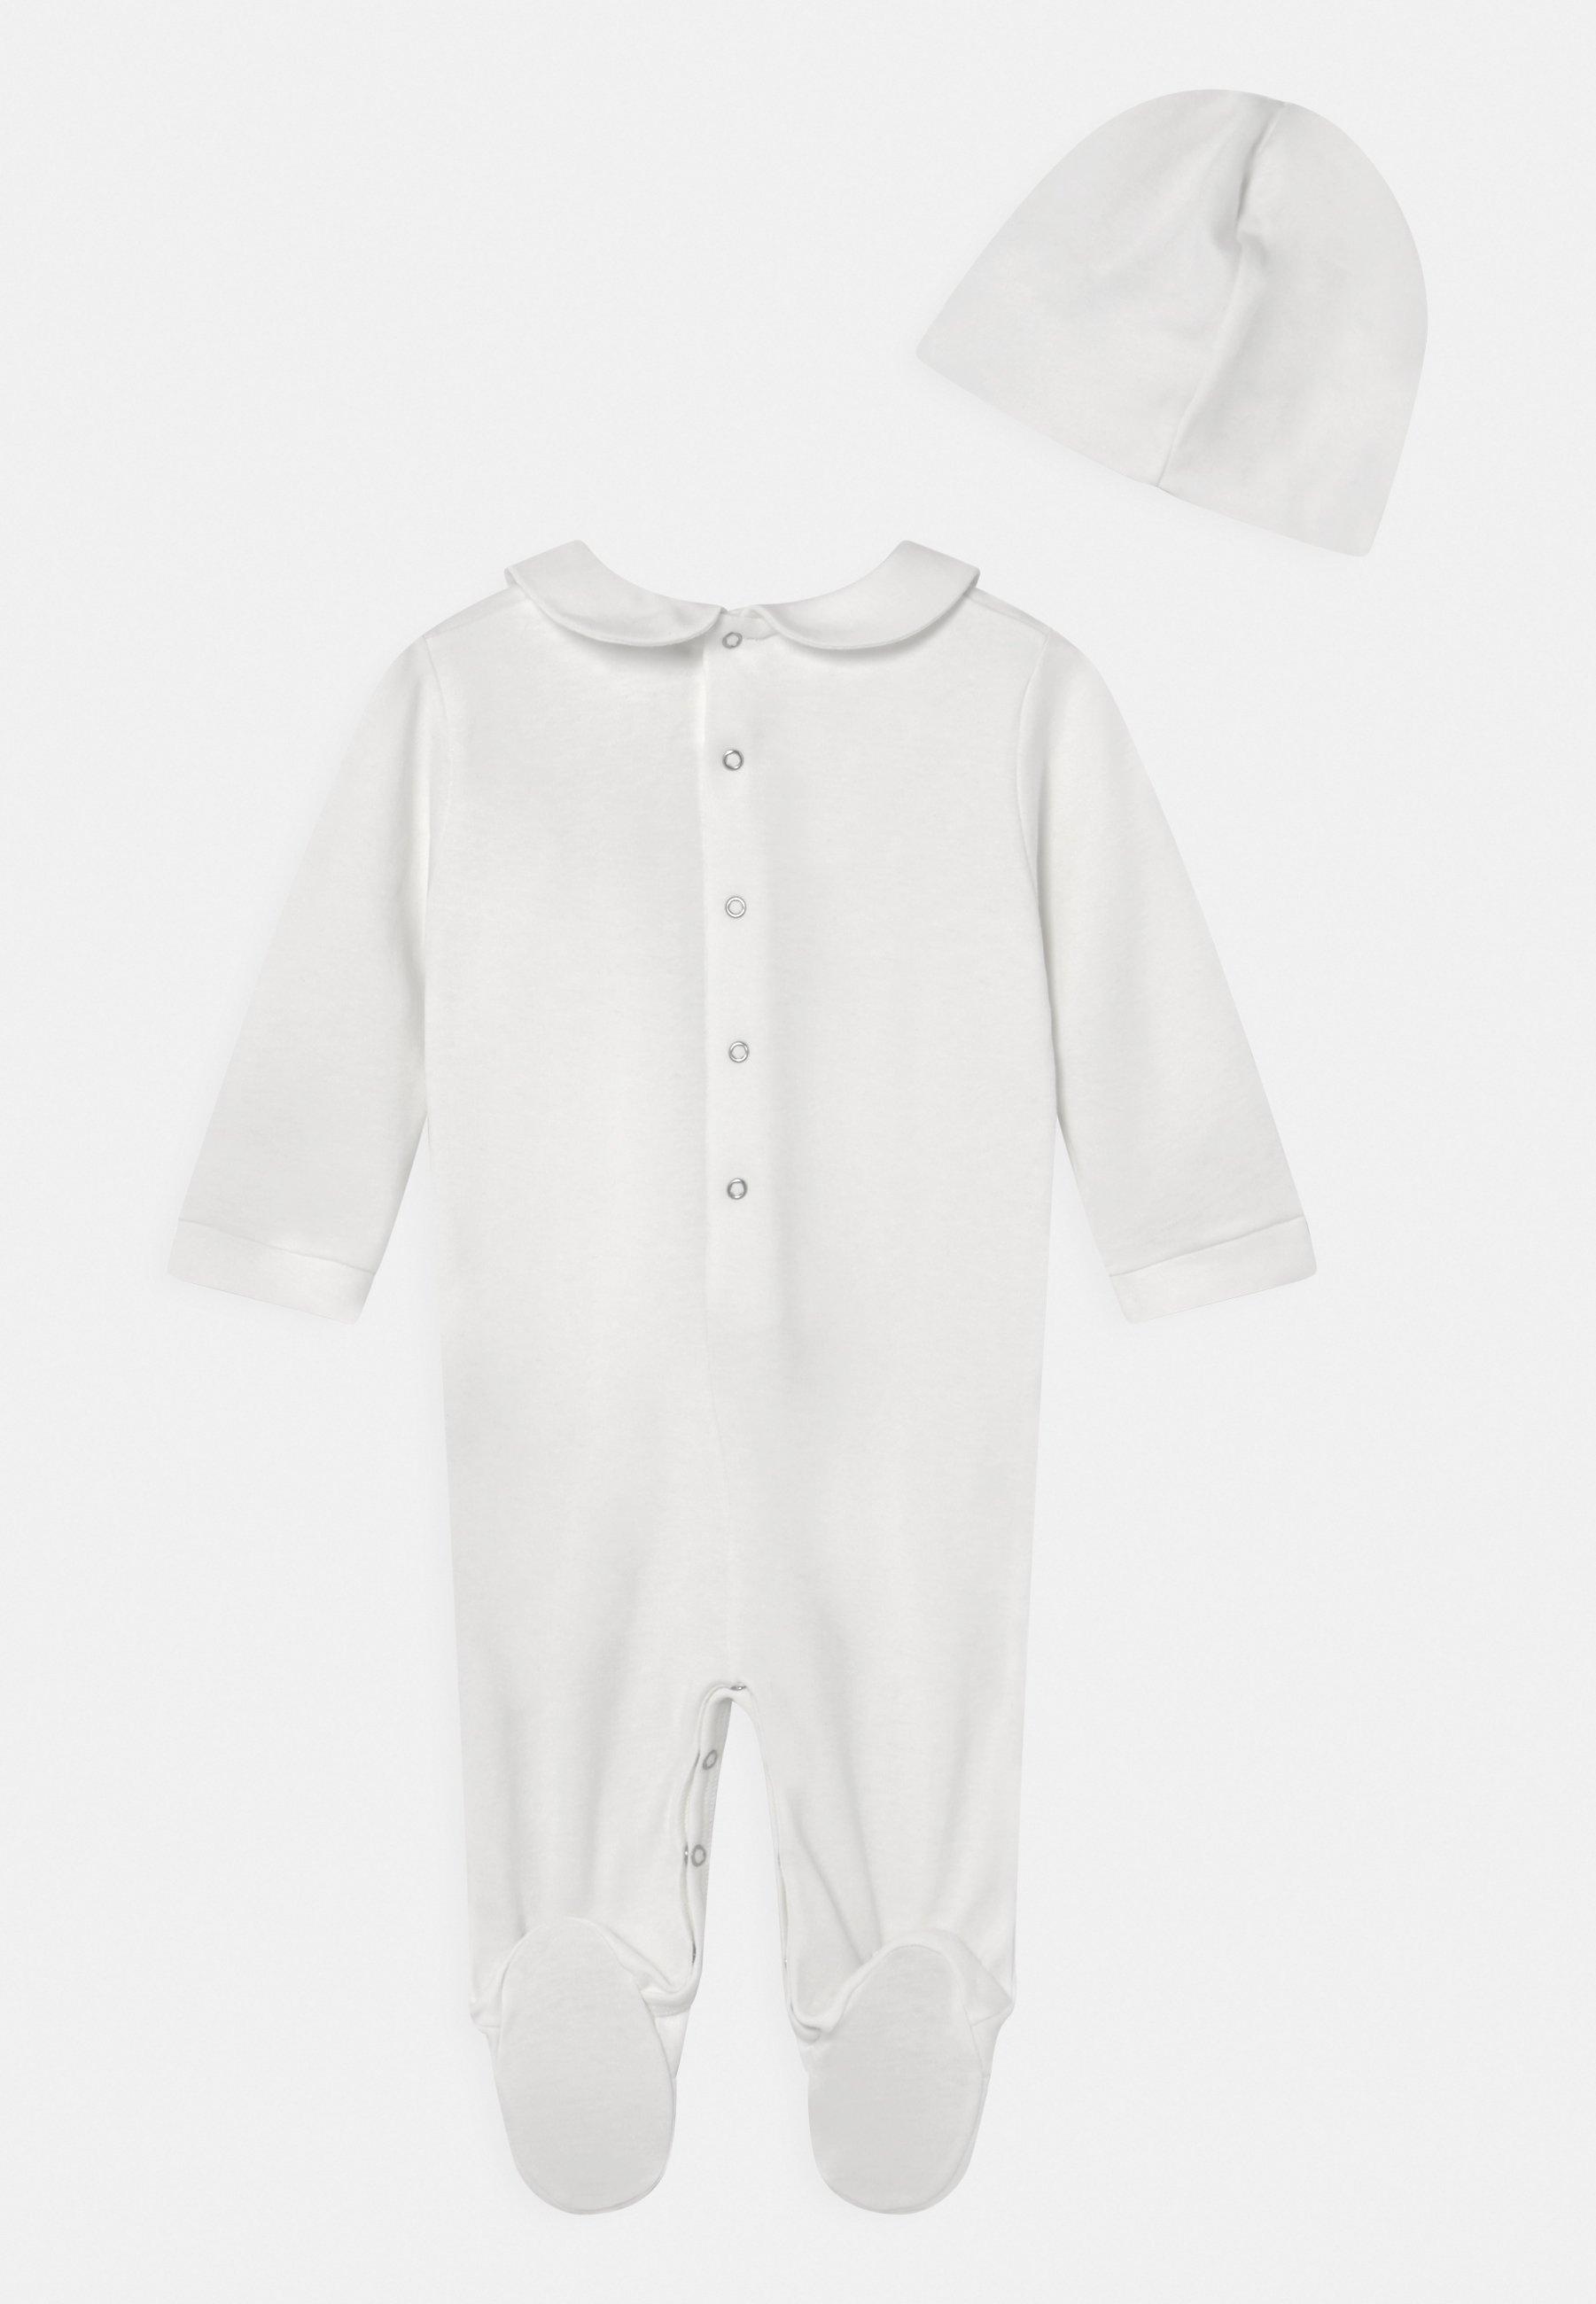 Kids GIFT-BOX ORSETTO UNISEX SET - Sleep suit